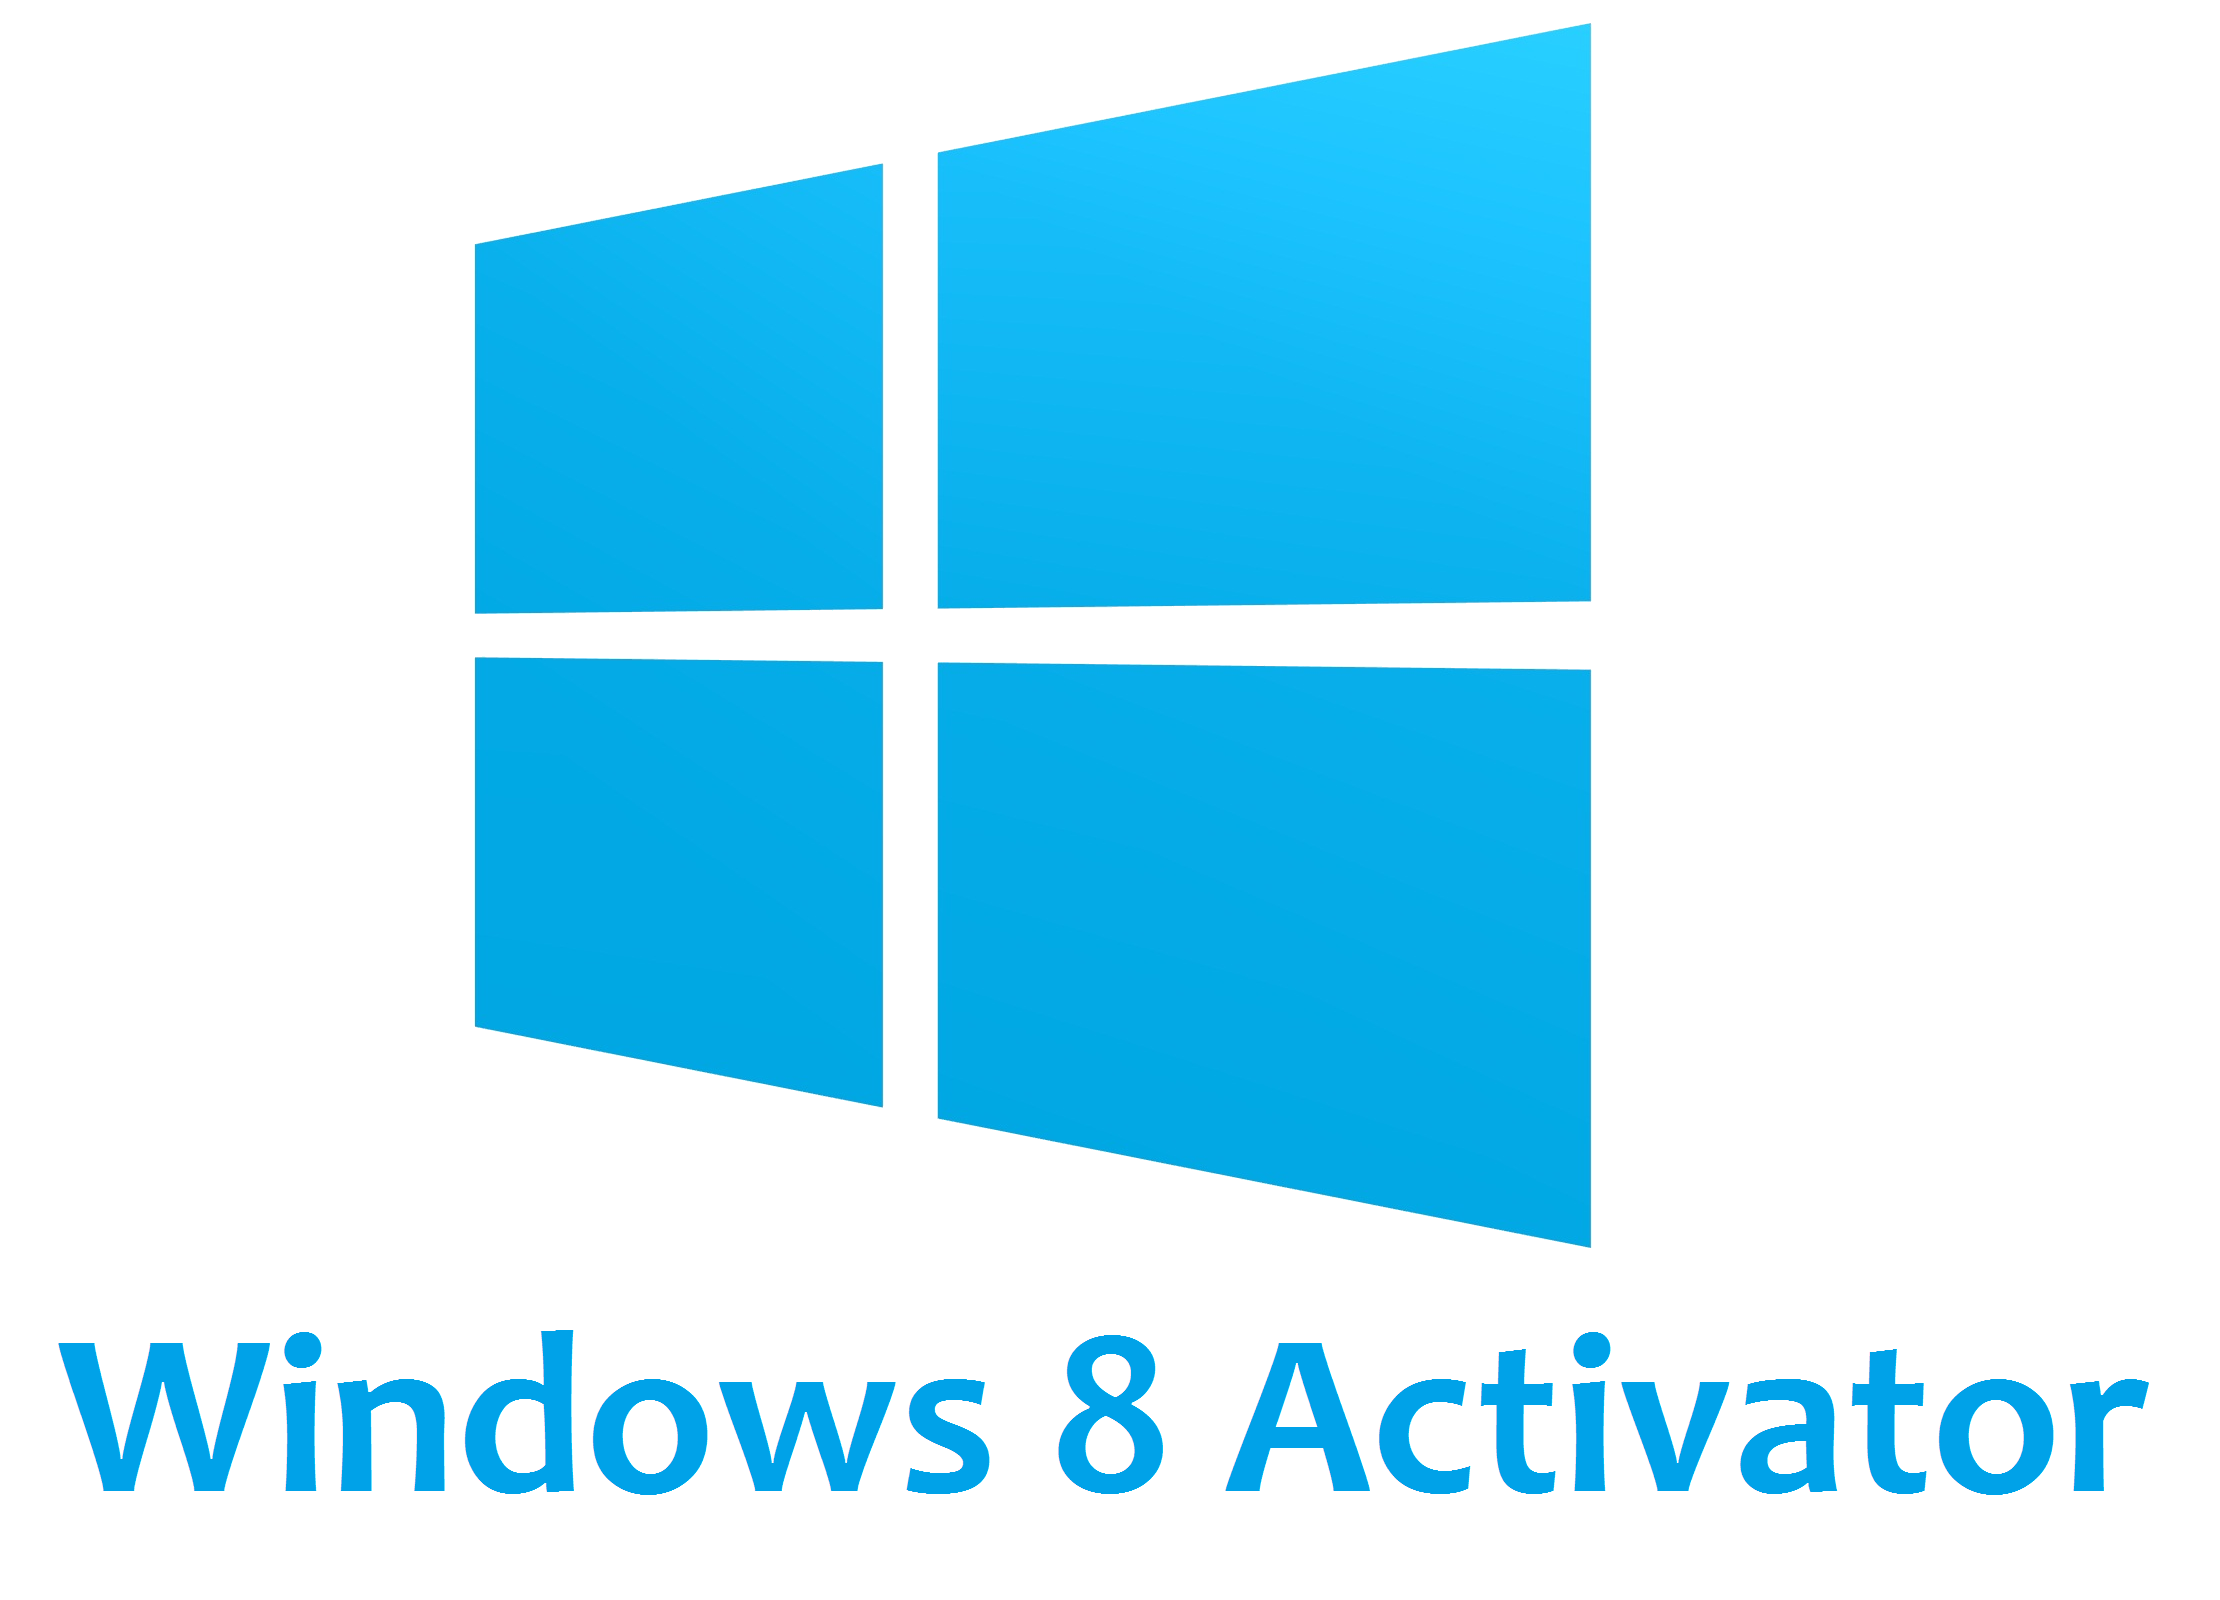 windows activator for windows 8 64 bit